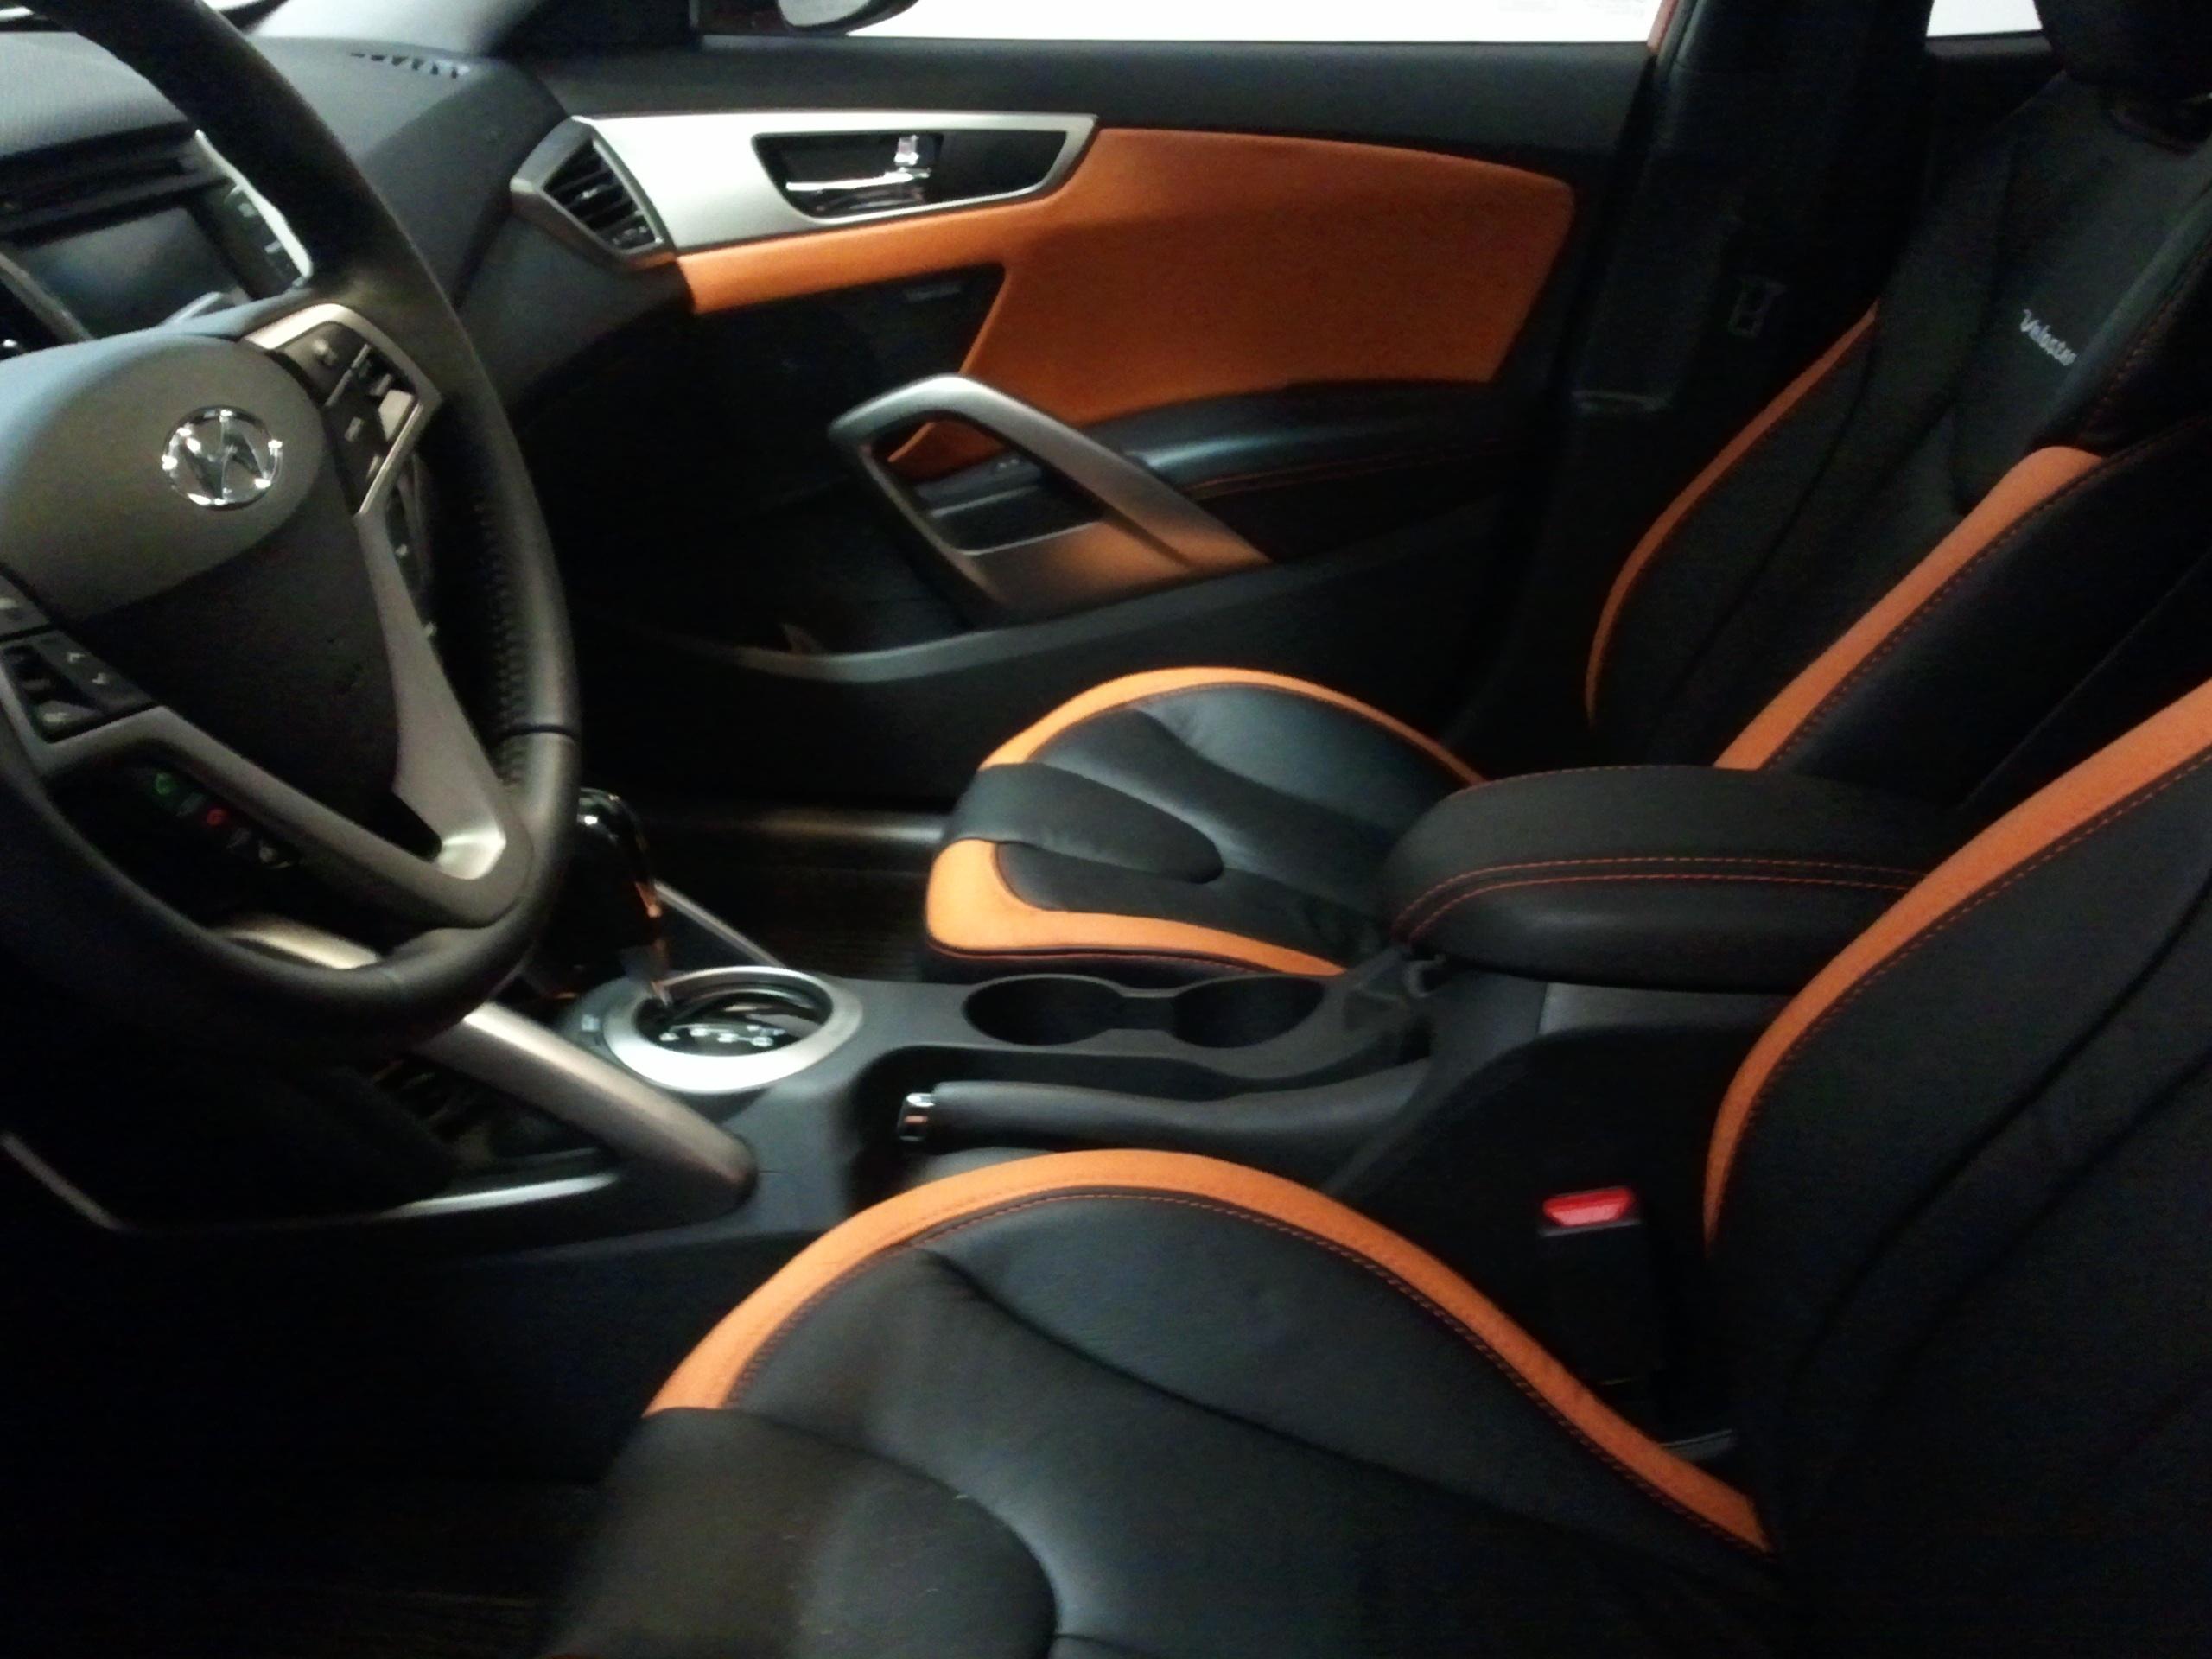 Marvelous ... Custom Leather Interior For My Vitamin C  Great Ideas